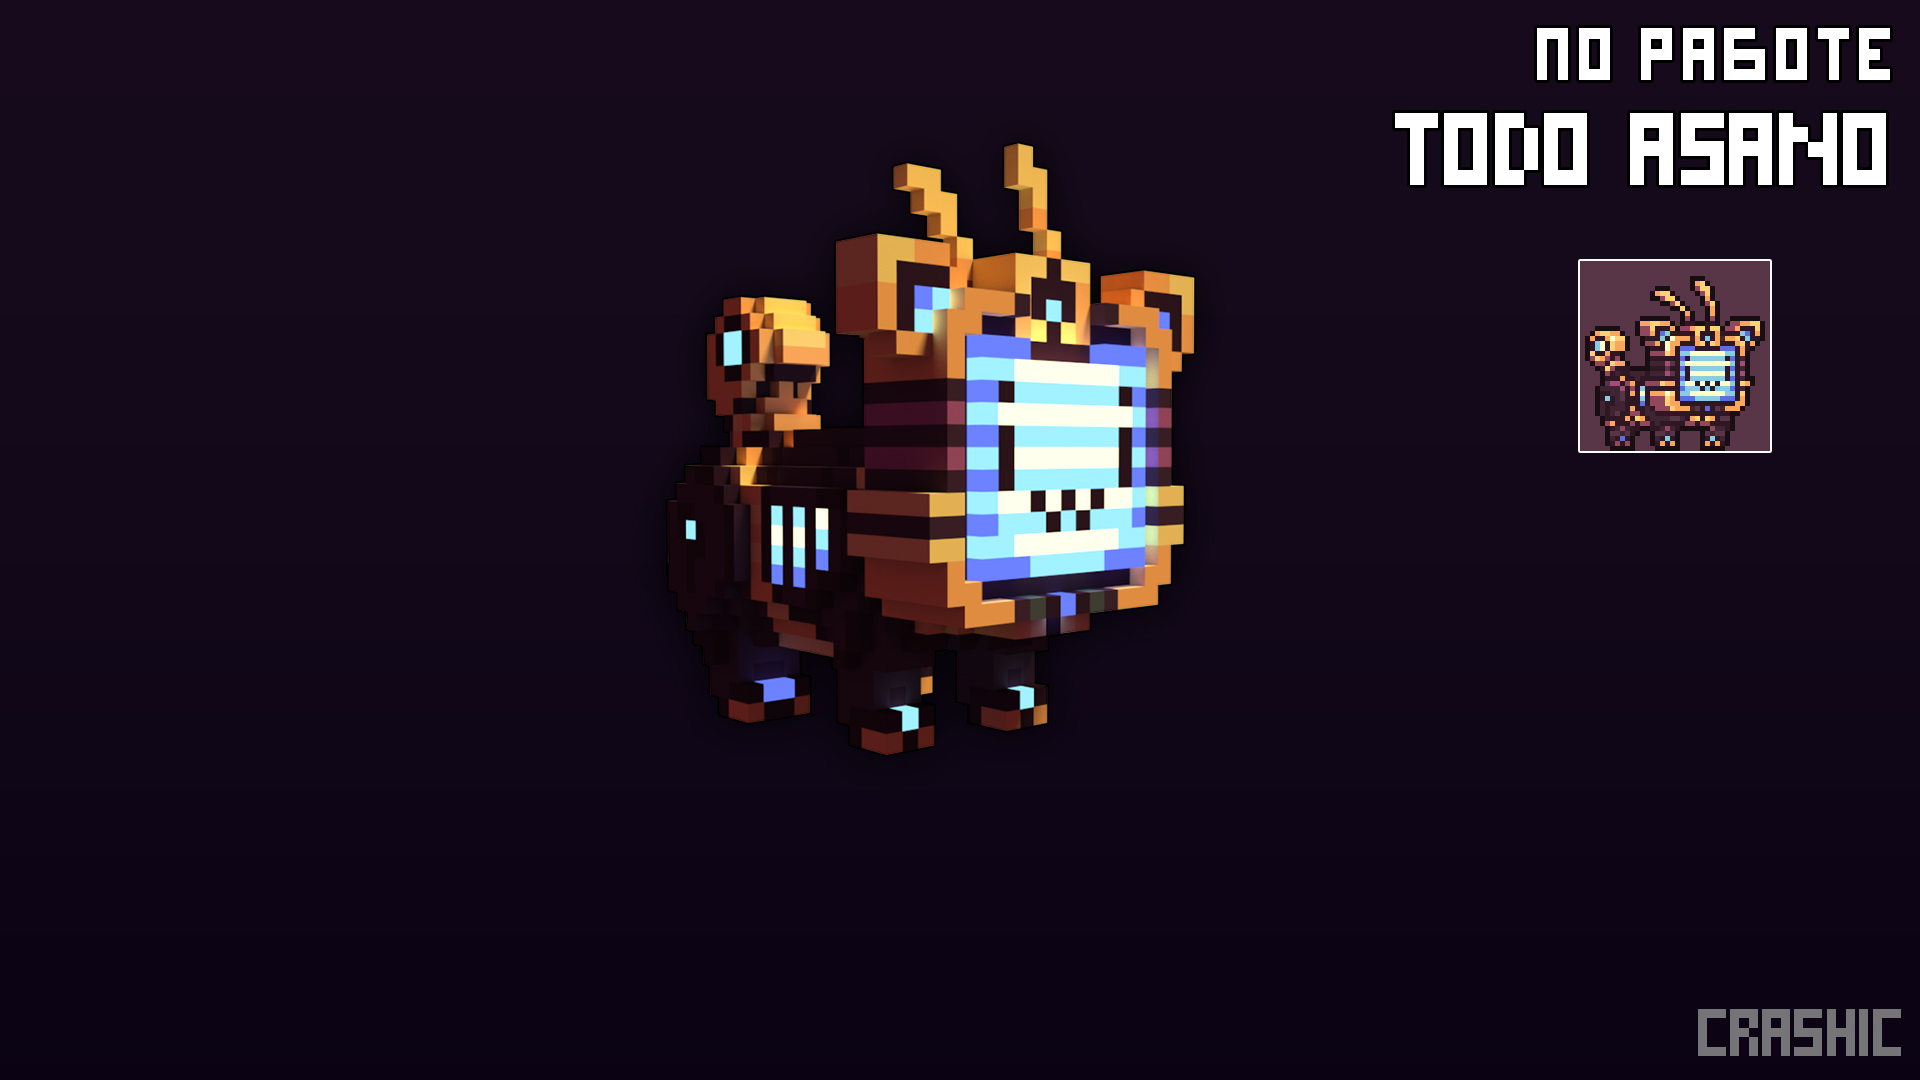 Todo Bot